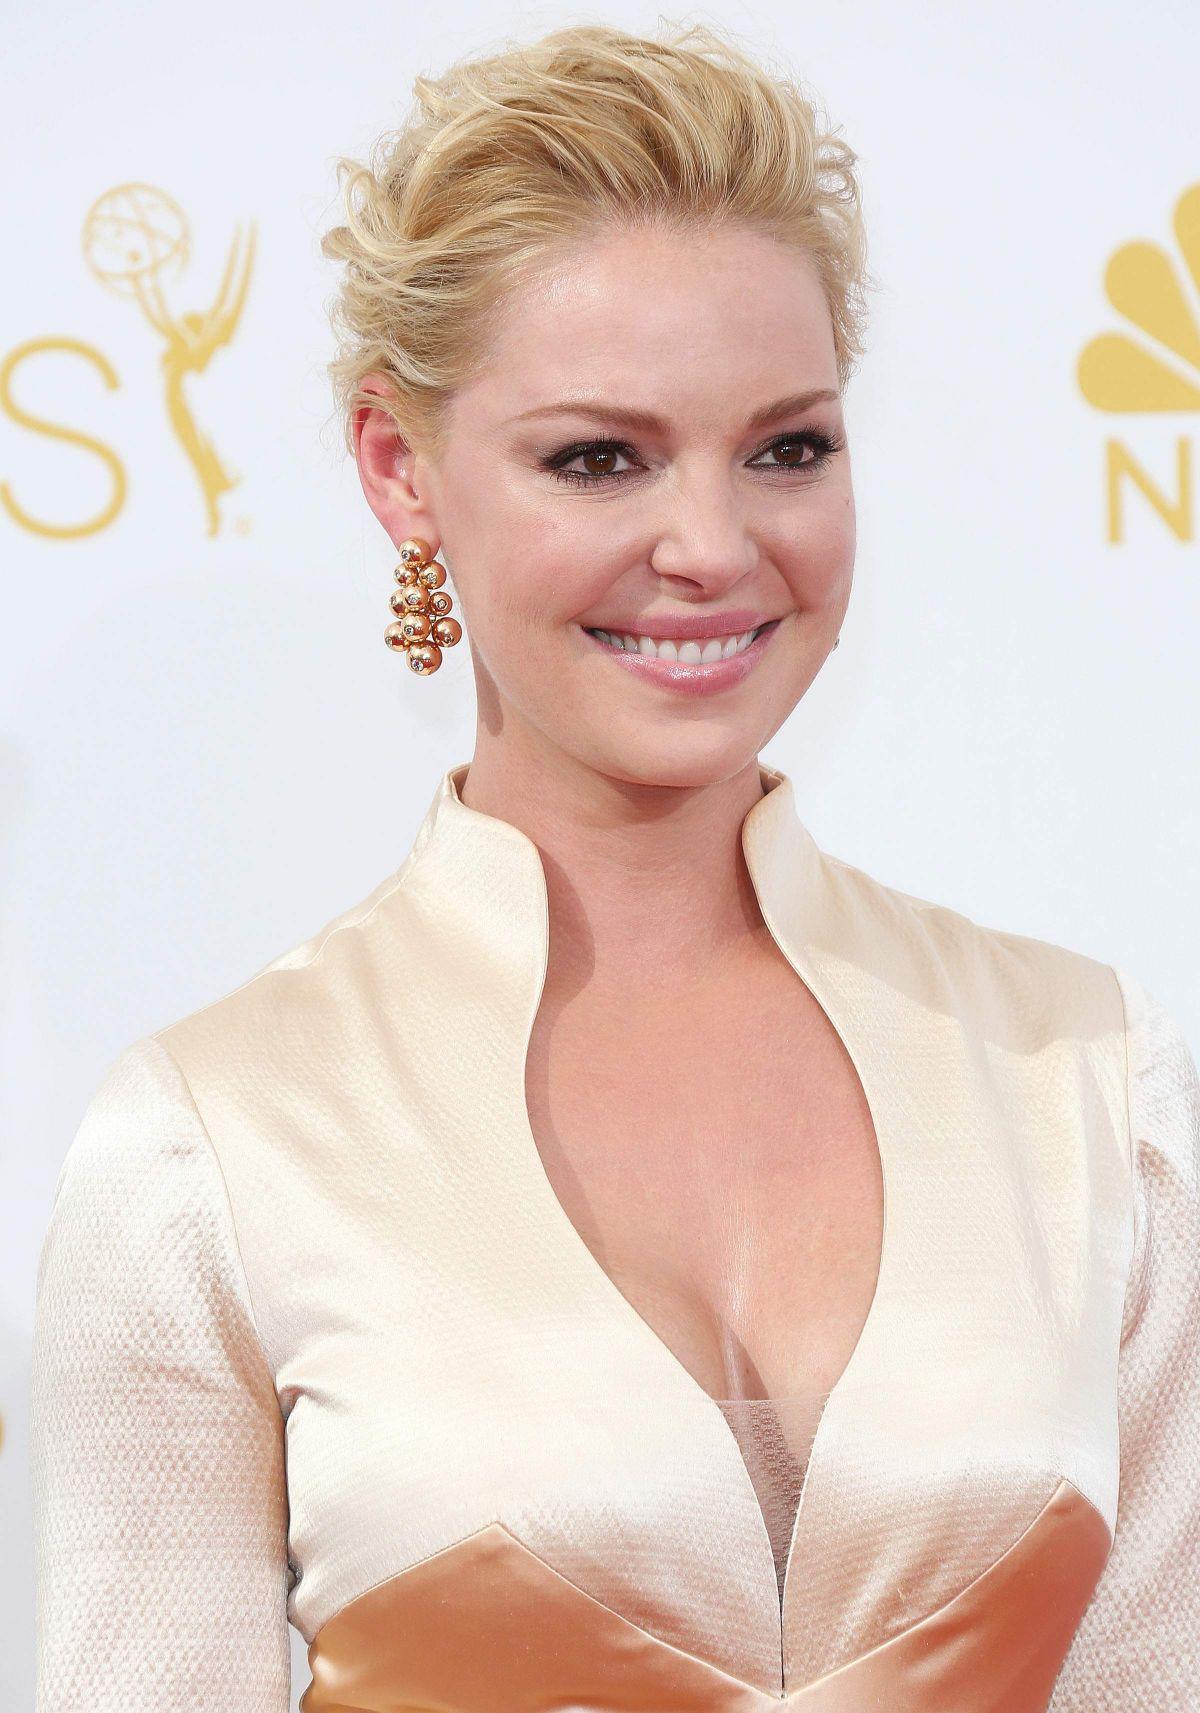 KATHERINE HEIGL at 2014 Emmy Awards - HawtCelebs - HawtCelebs Katherine Heigl